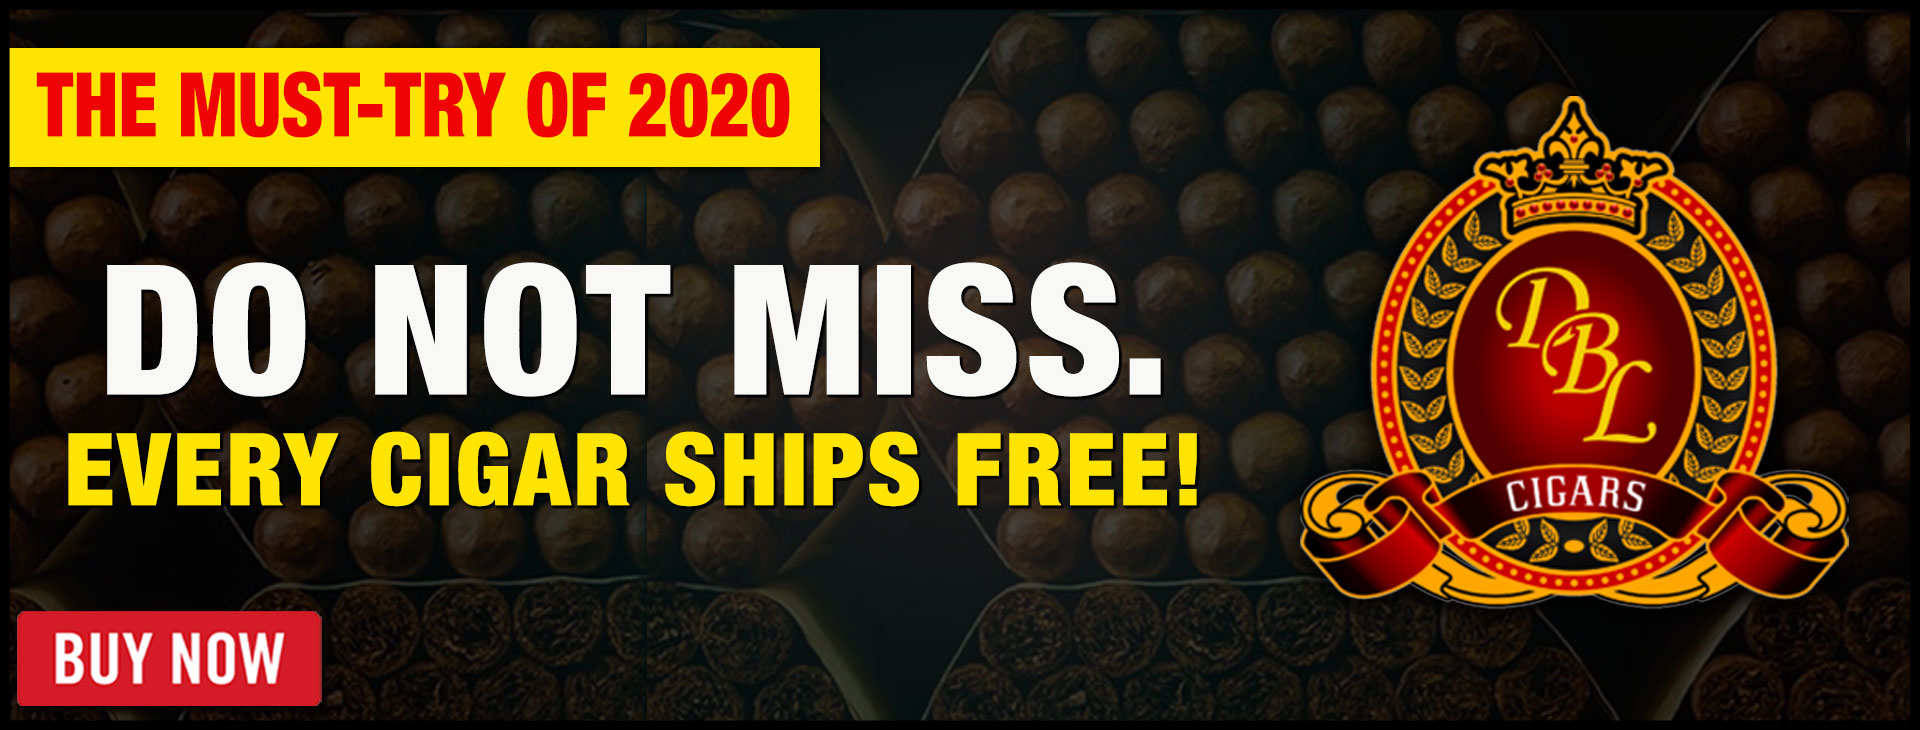 dbl-cigars-2-2020-banner.jpg